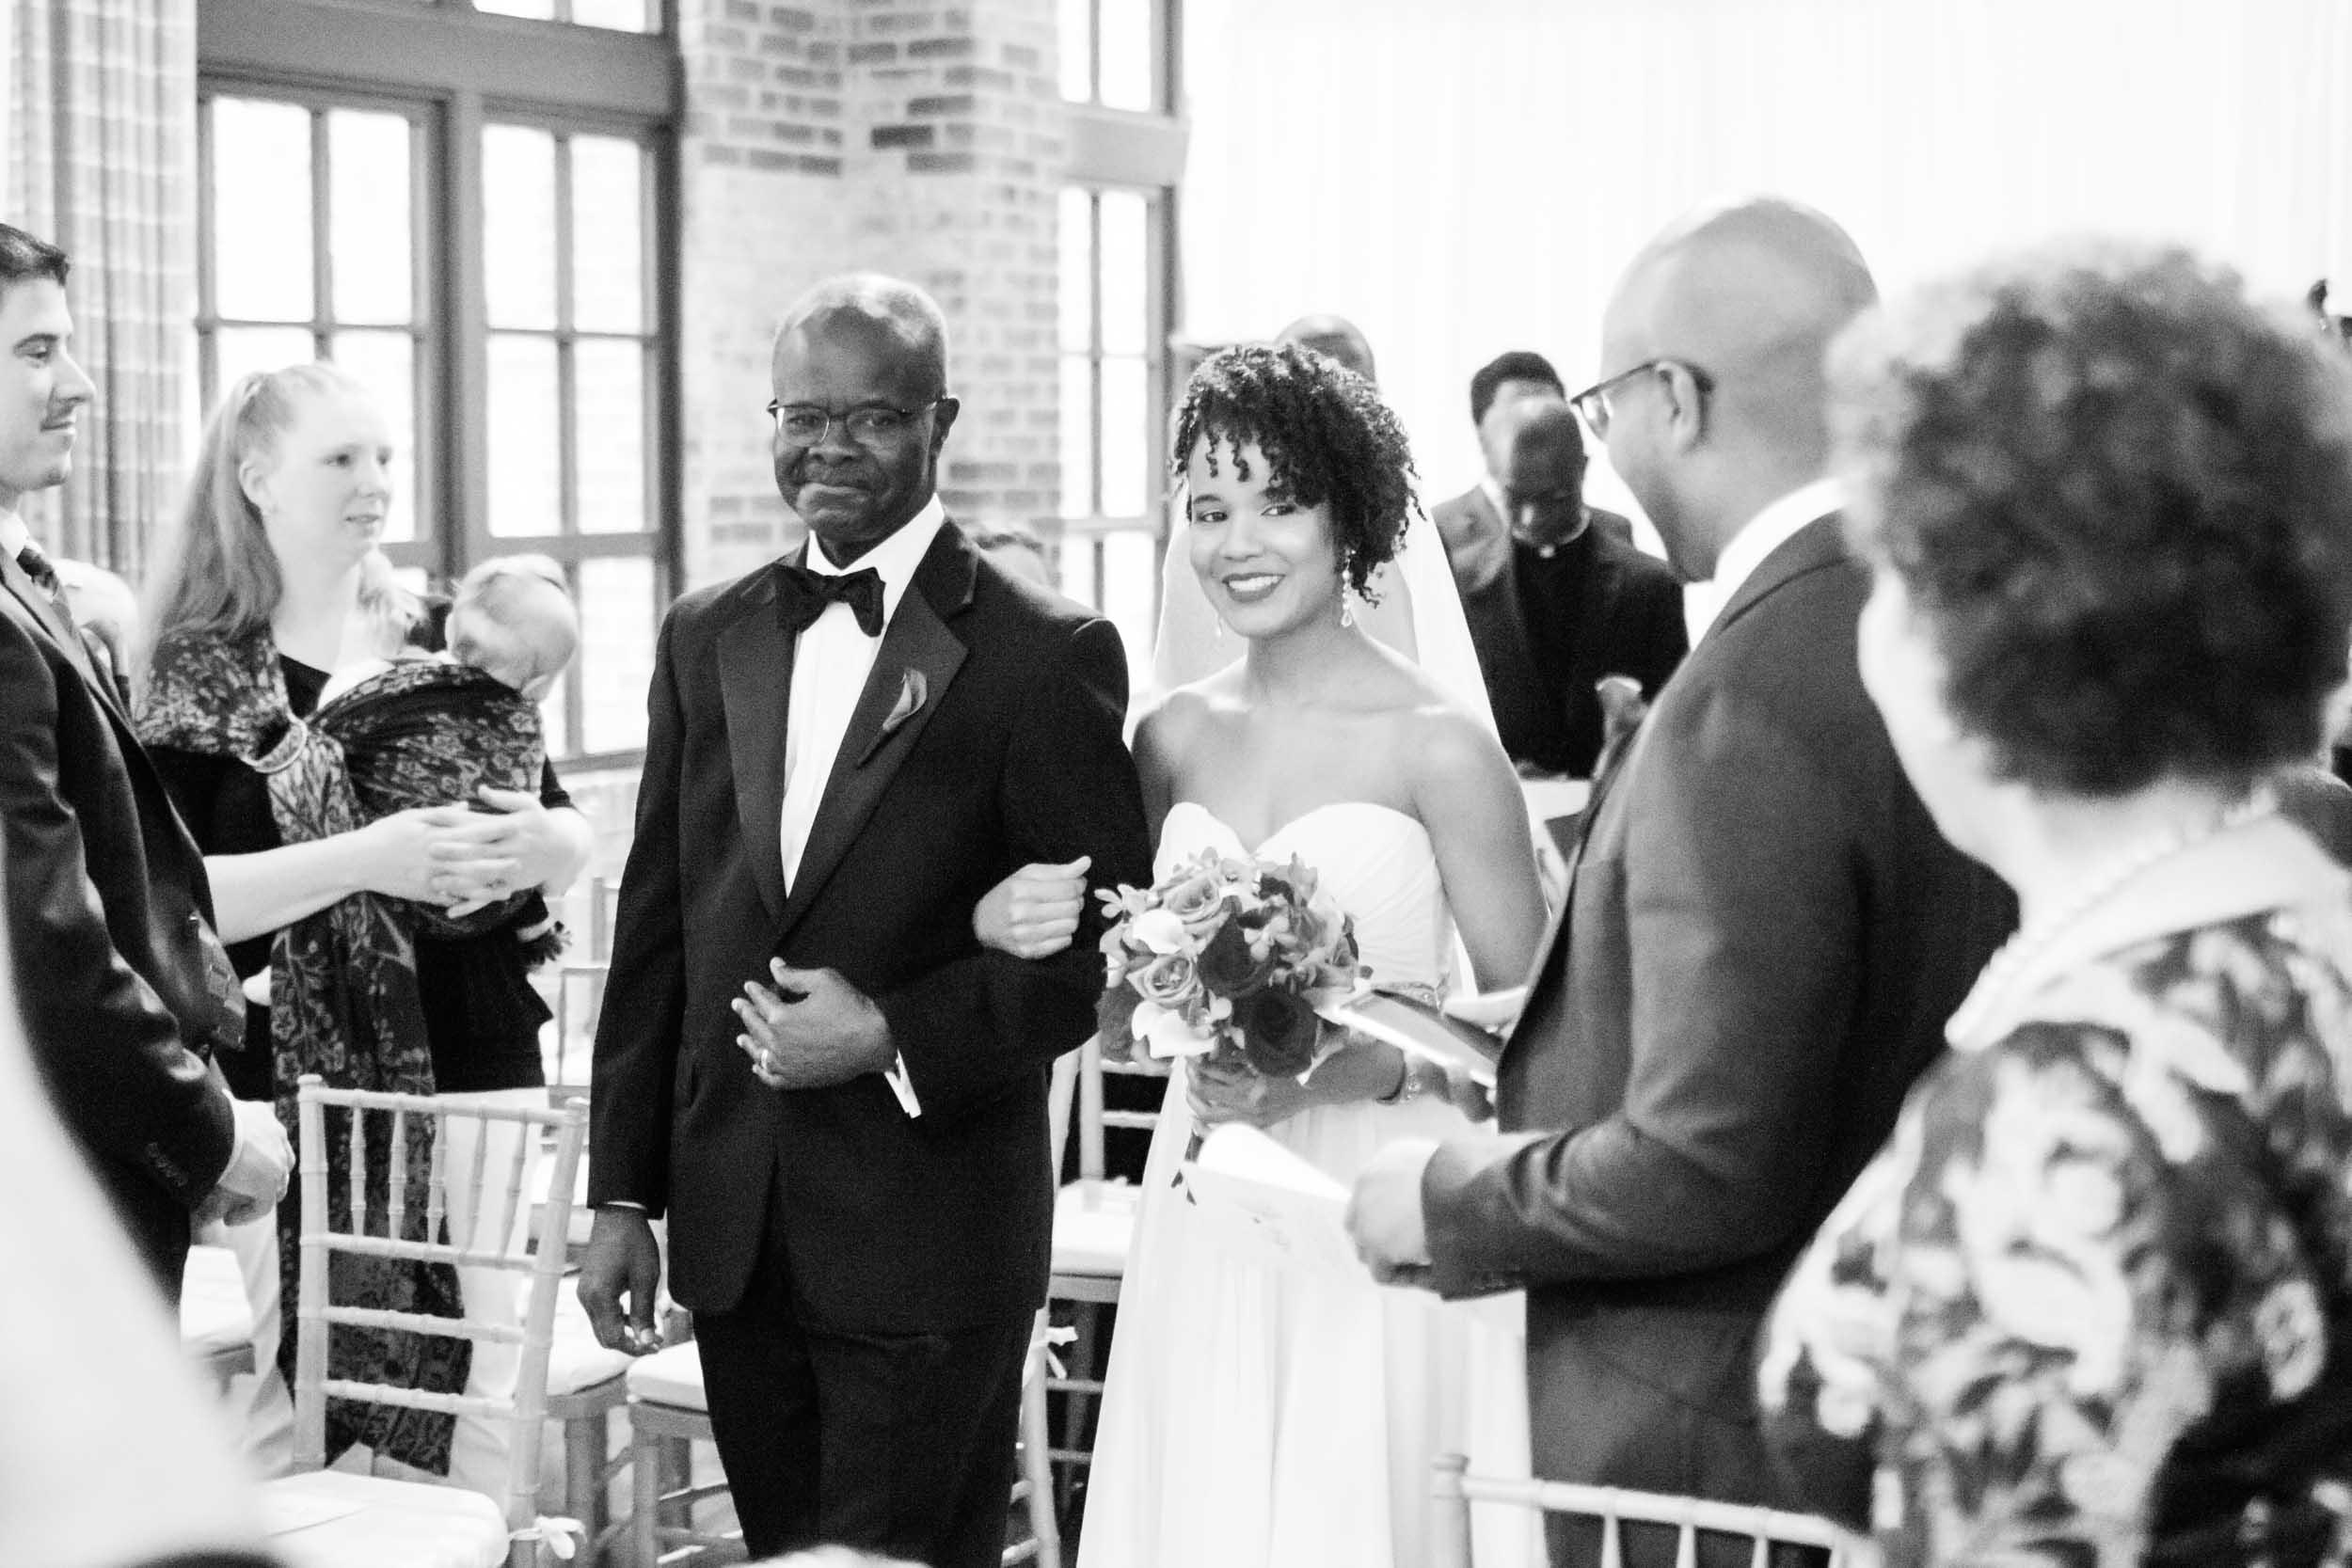 dc+metro+wedding+photographer+vadym+guliuk+photography+wedding+ceremony-2026.jpg